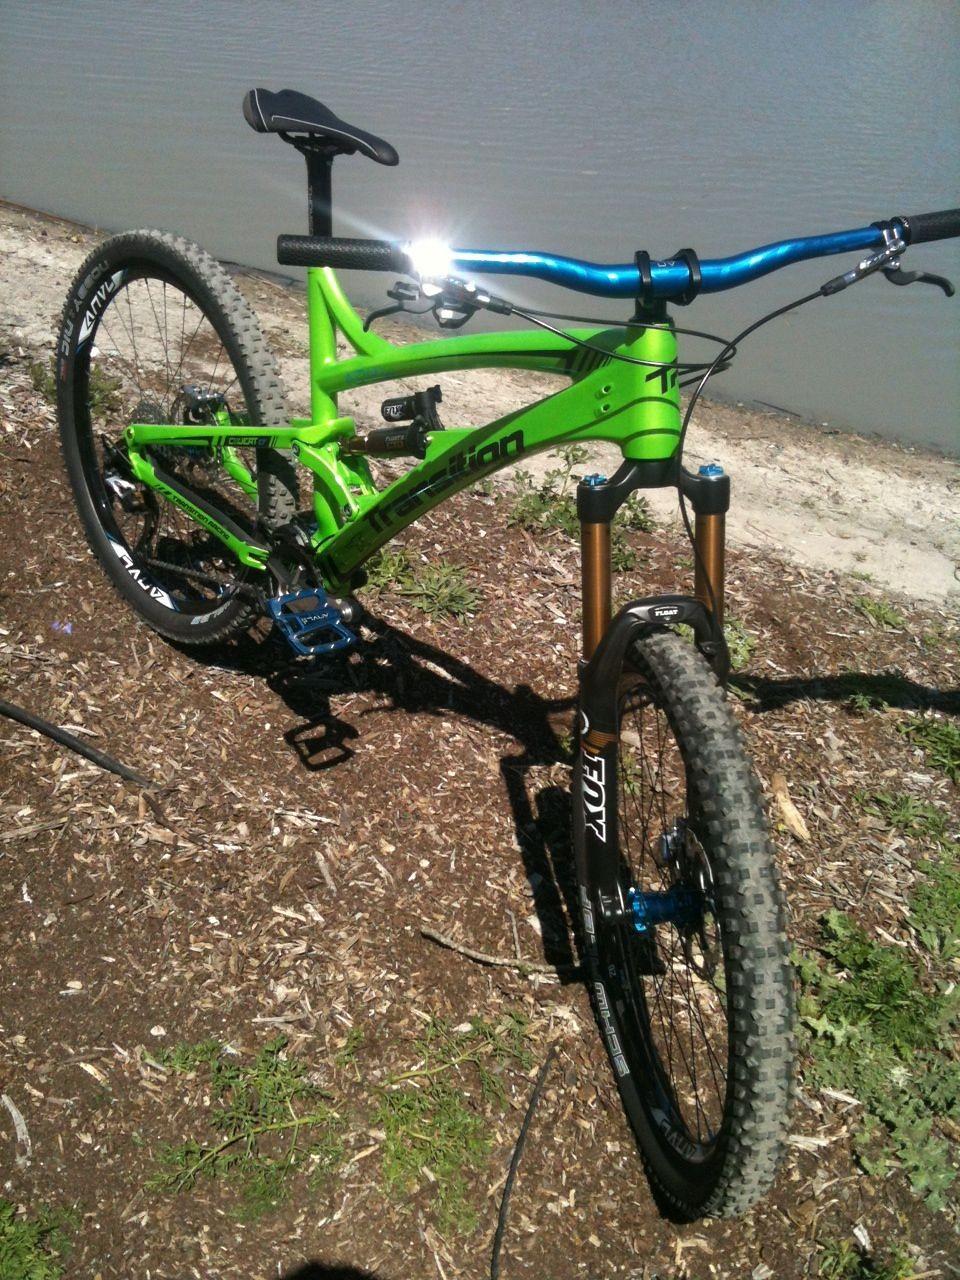 ANVL on bike - iceman2058 - Mountain Biking Pictures - Vital MTB